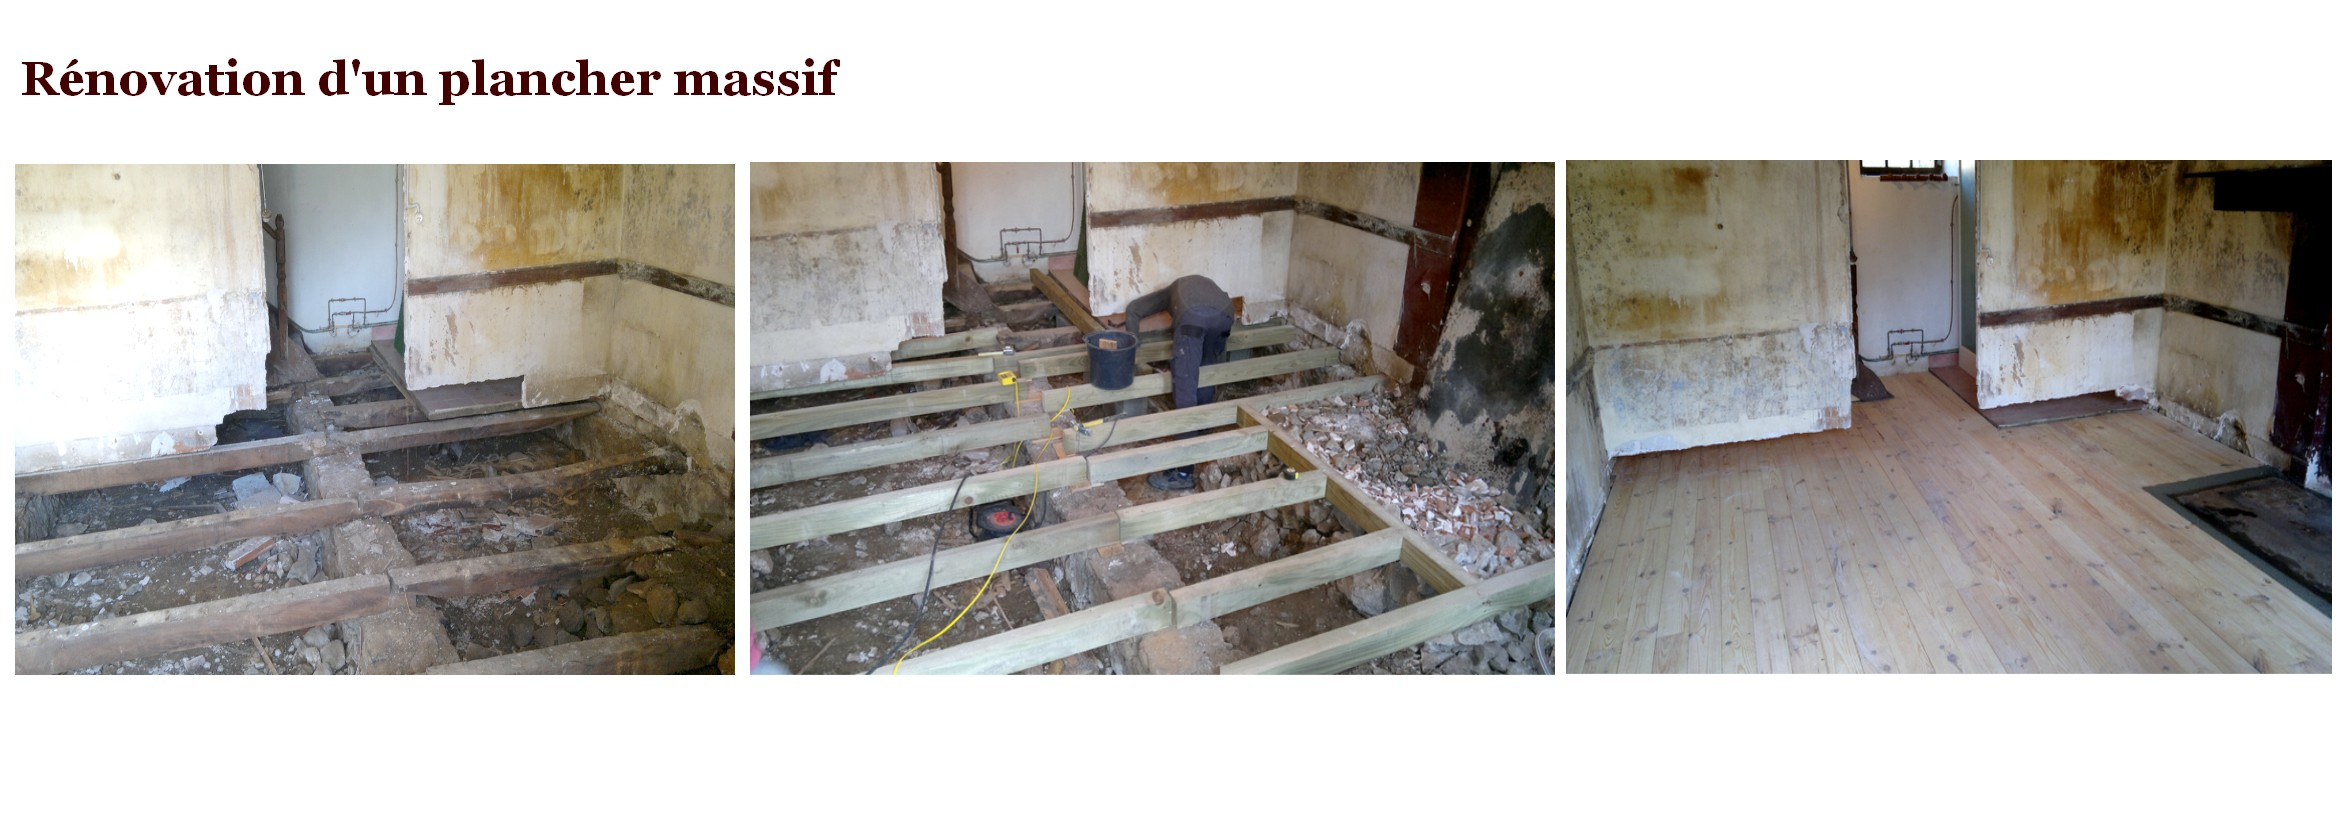 renovation plancher massif